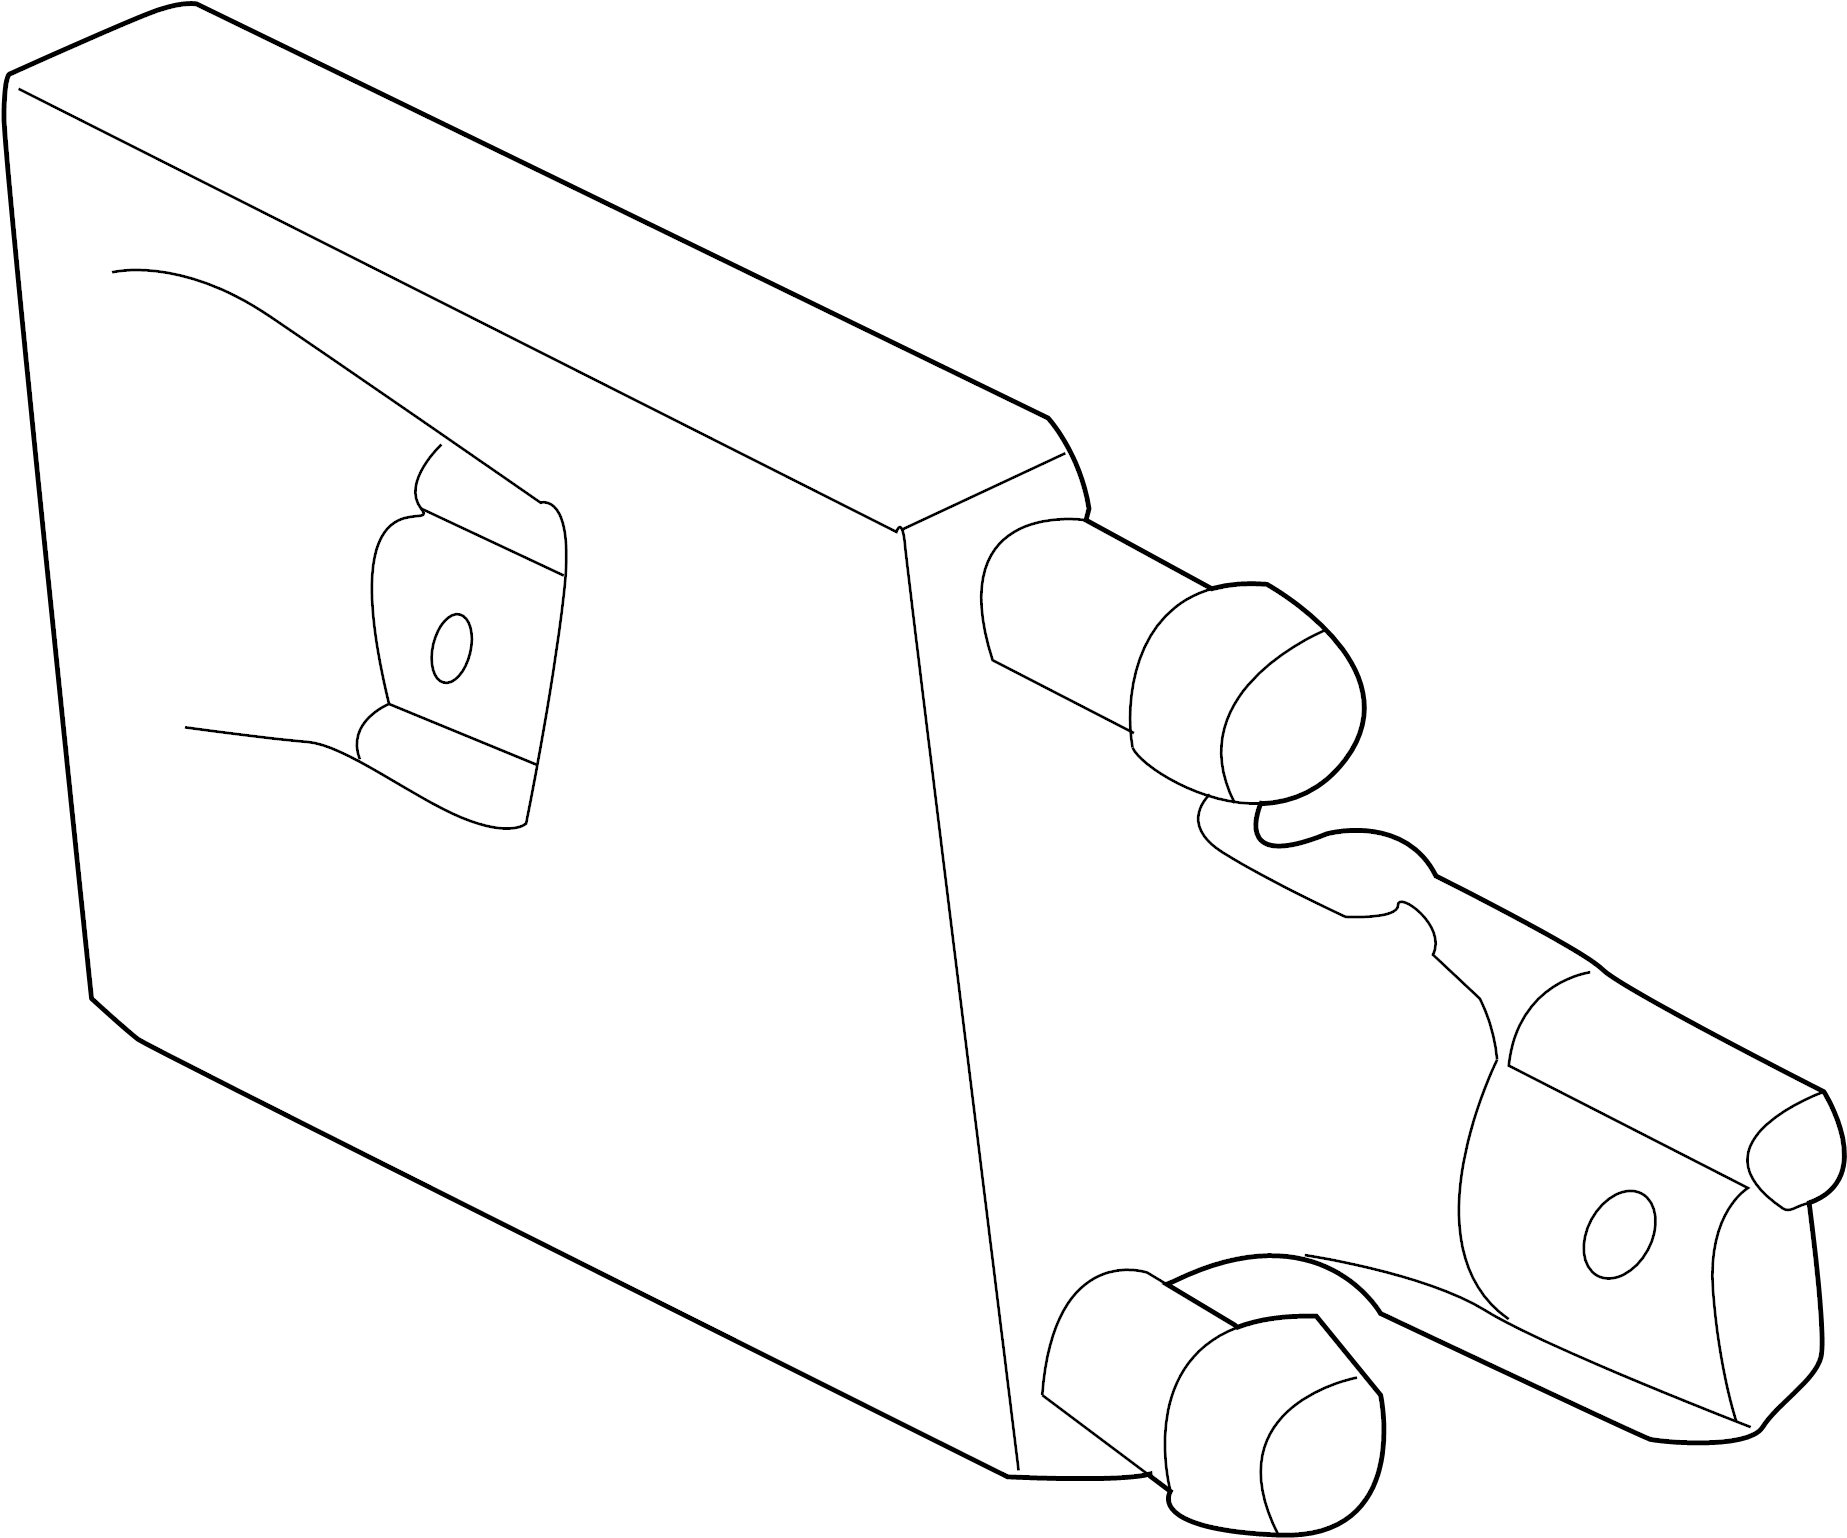 3c3z3d746aa